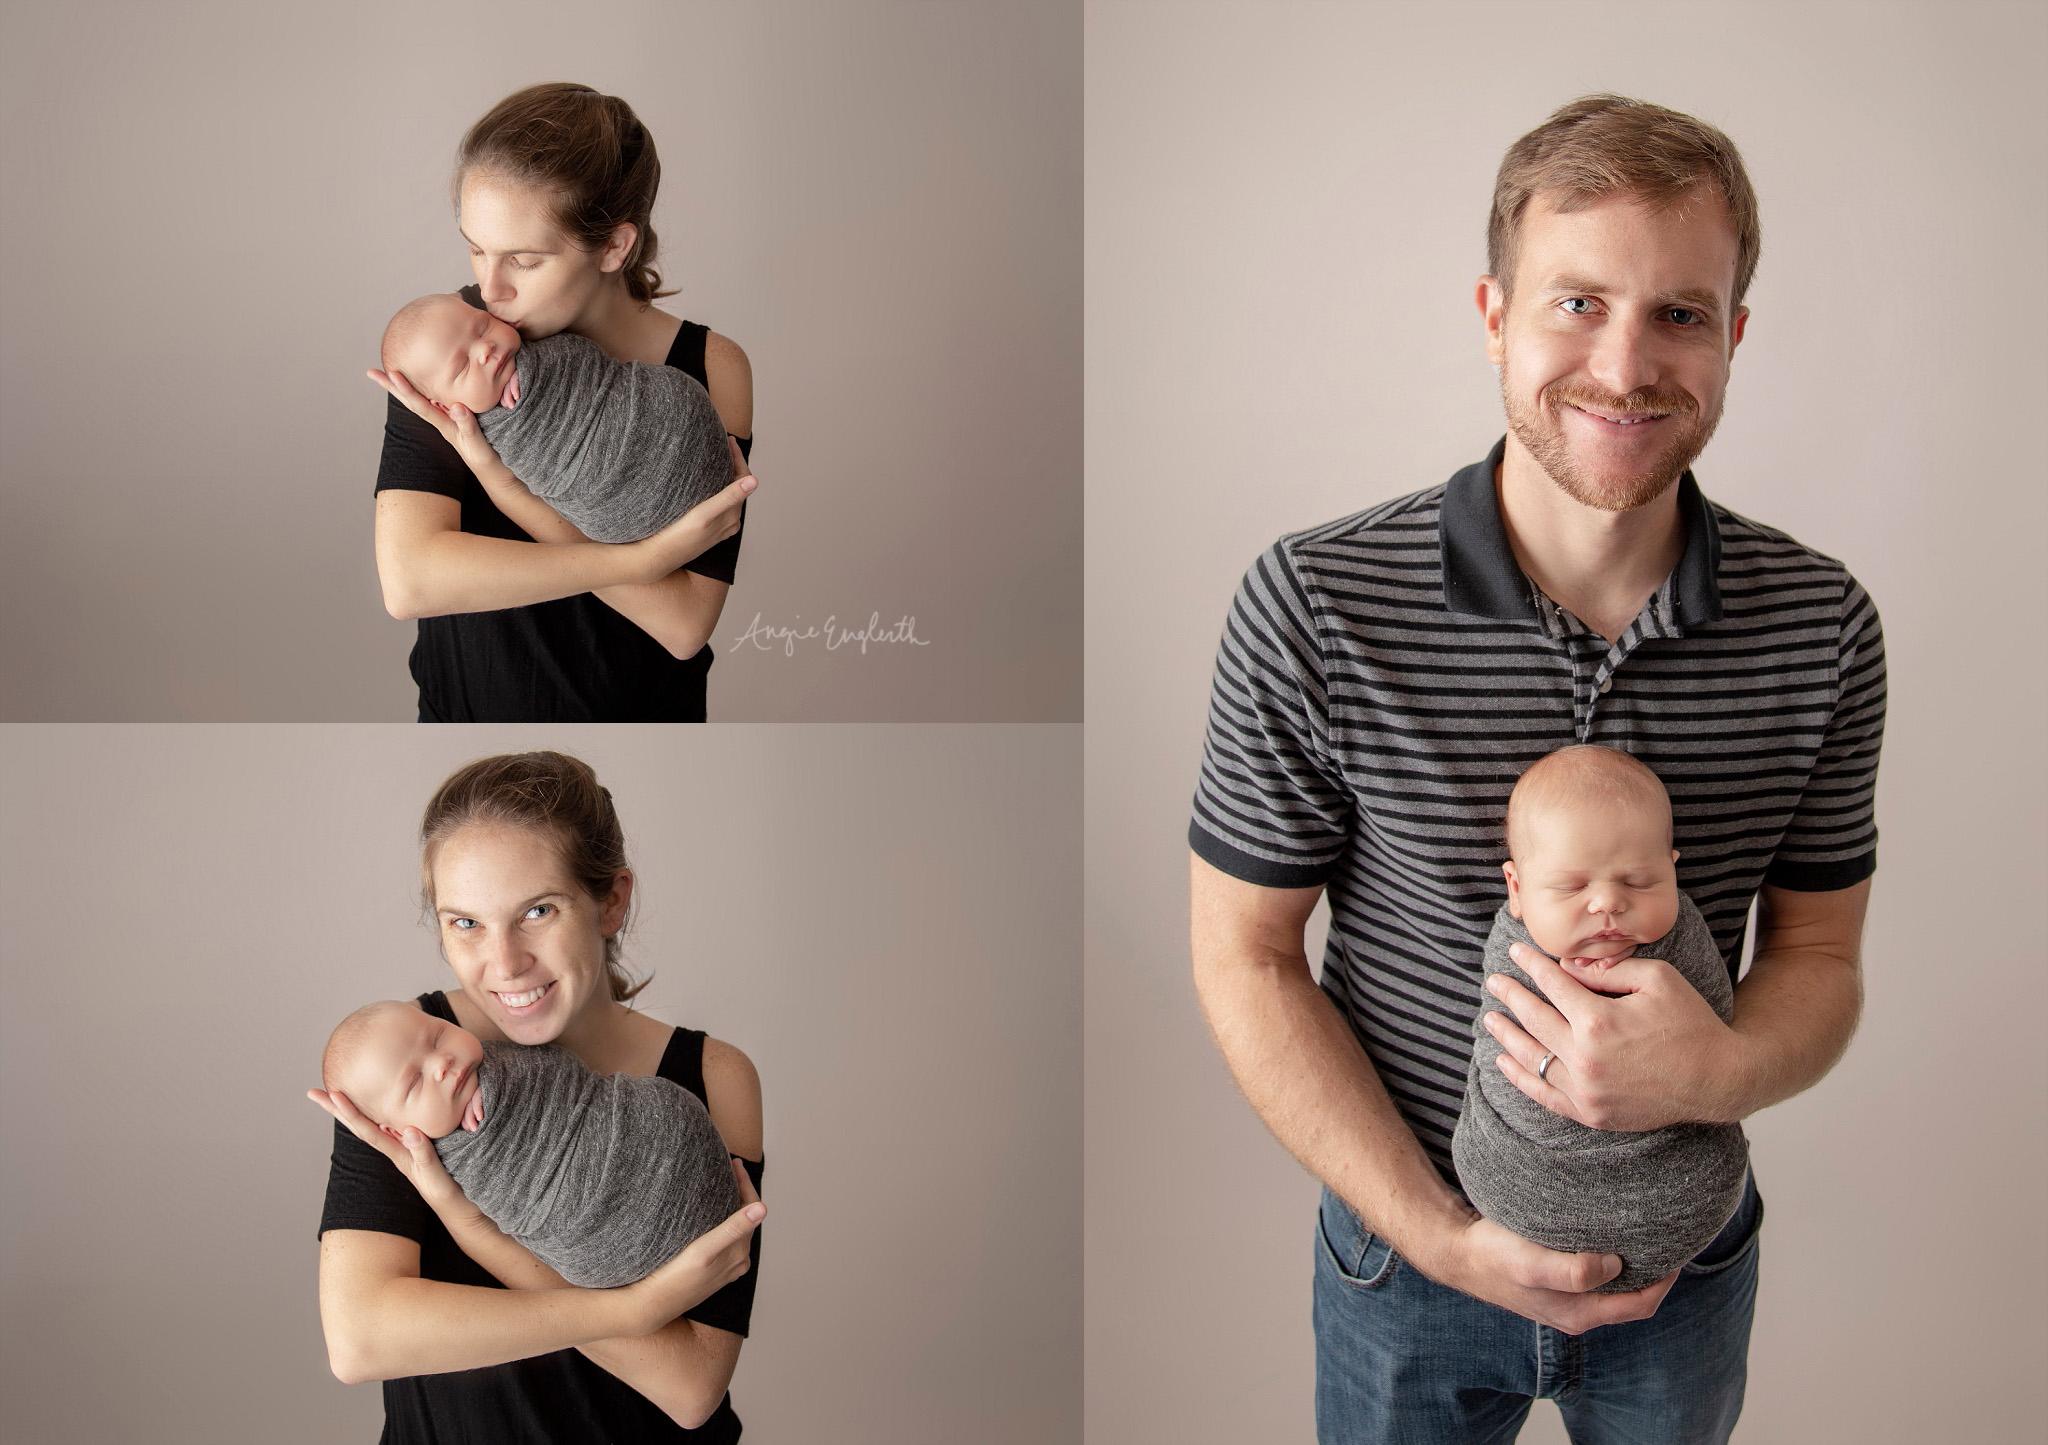 lancaster_newborn_photographer_angie_englerth_central_pa_026.jpg